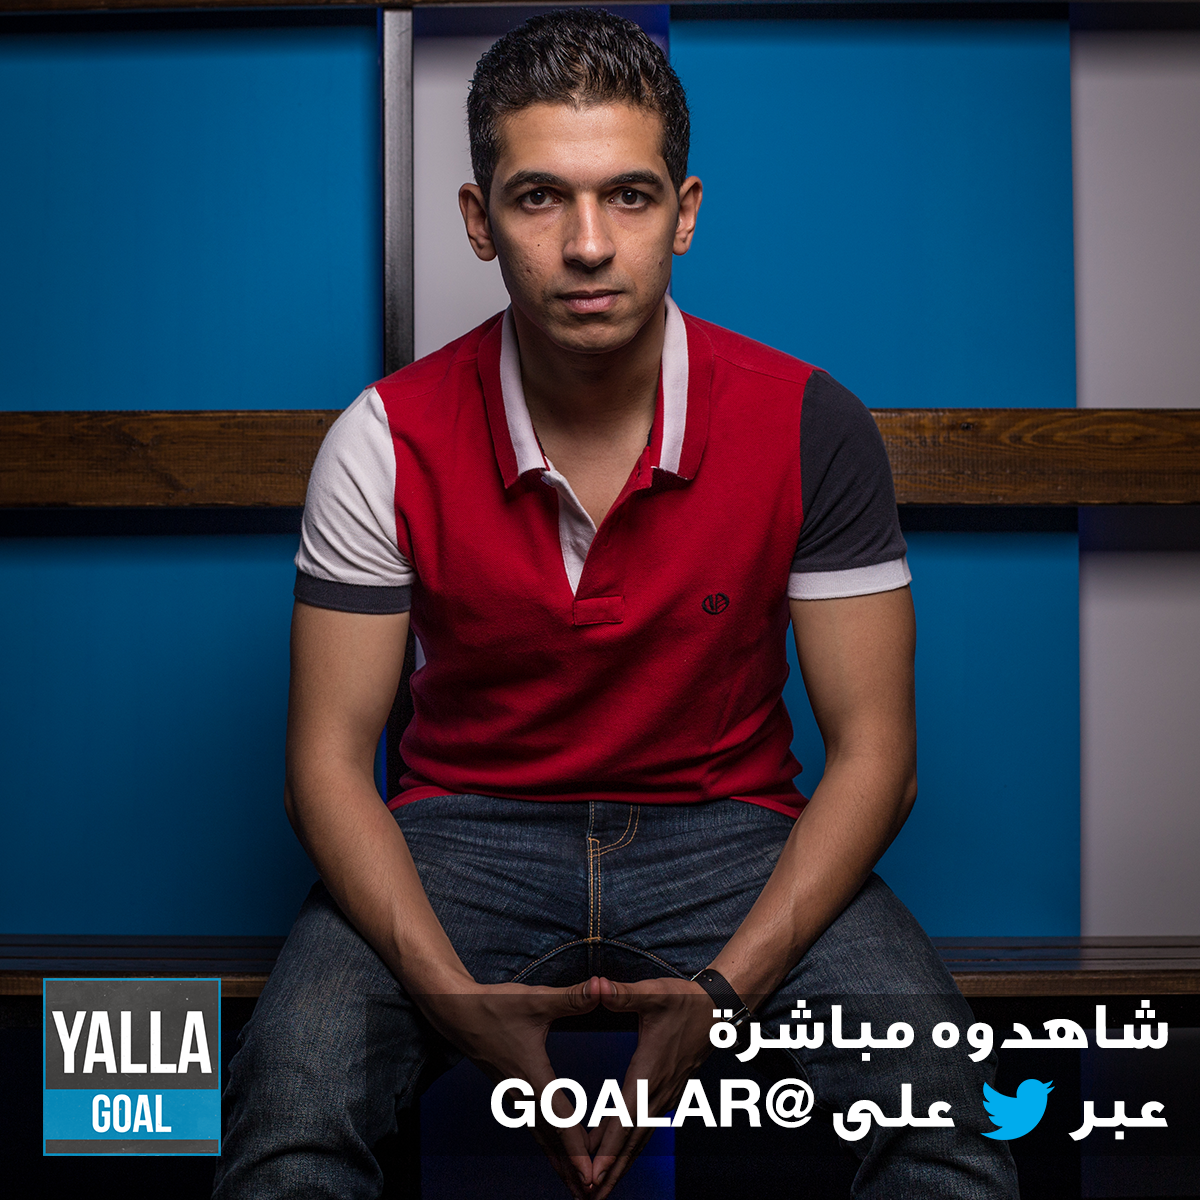 Yalla goal Hany